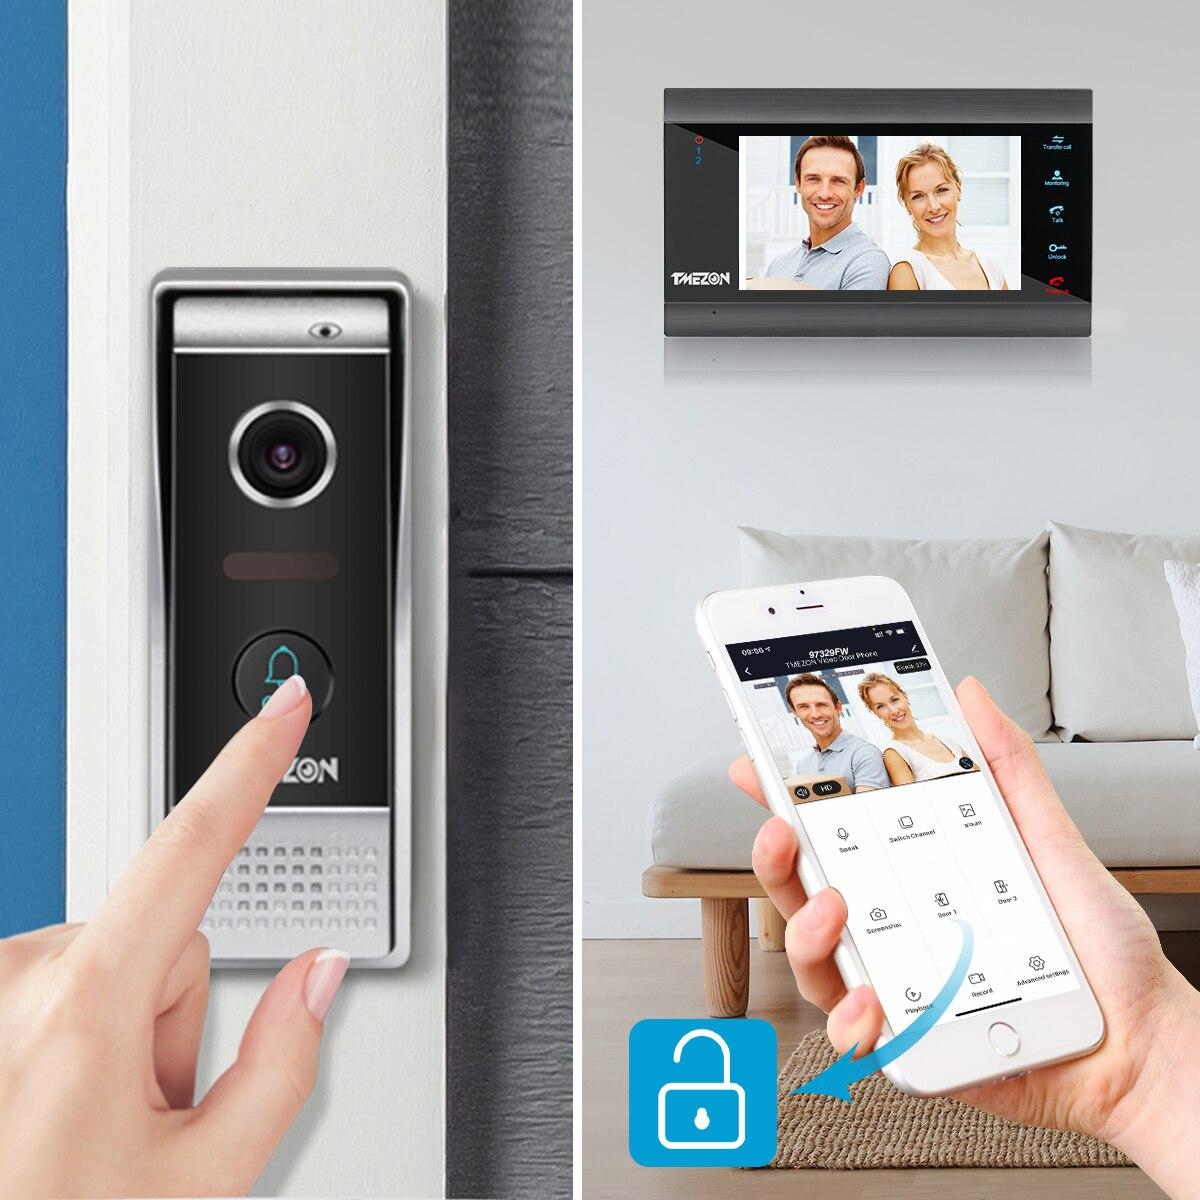 Home Intercom System Wireless WiFi Smart IP Video Doorbell 7 Inch with 1x1200TVL Wired Door Phone Camera enlarge